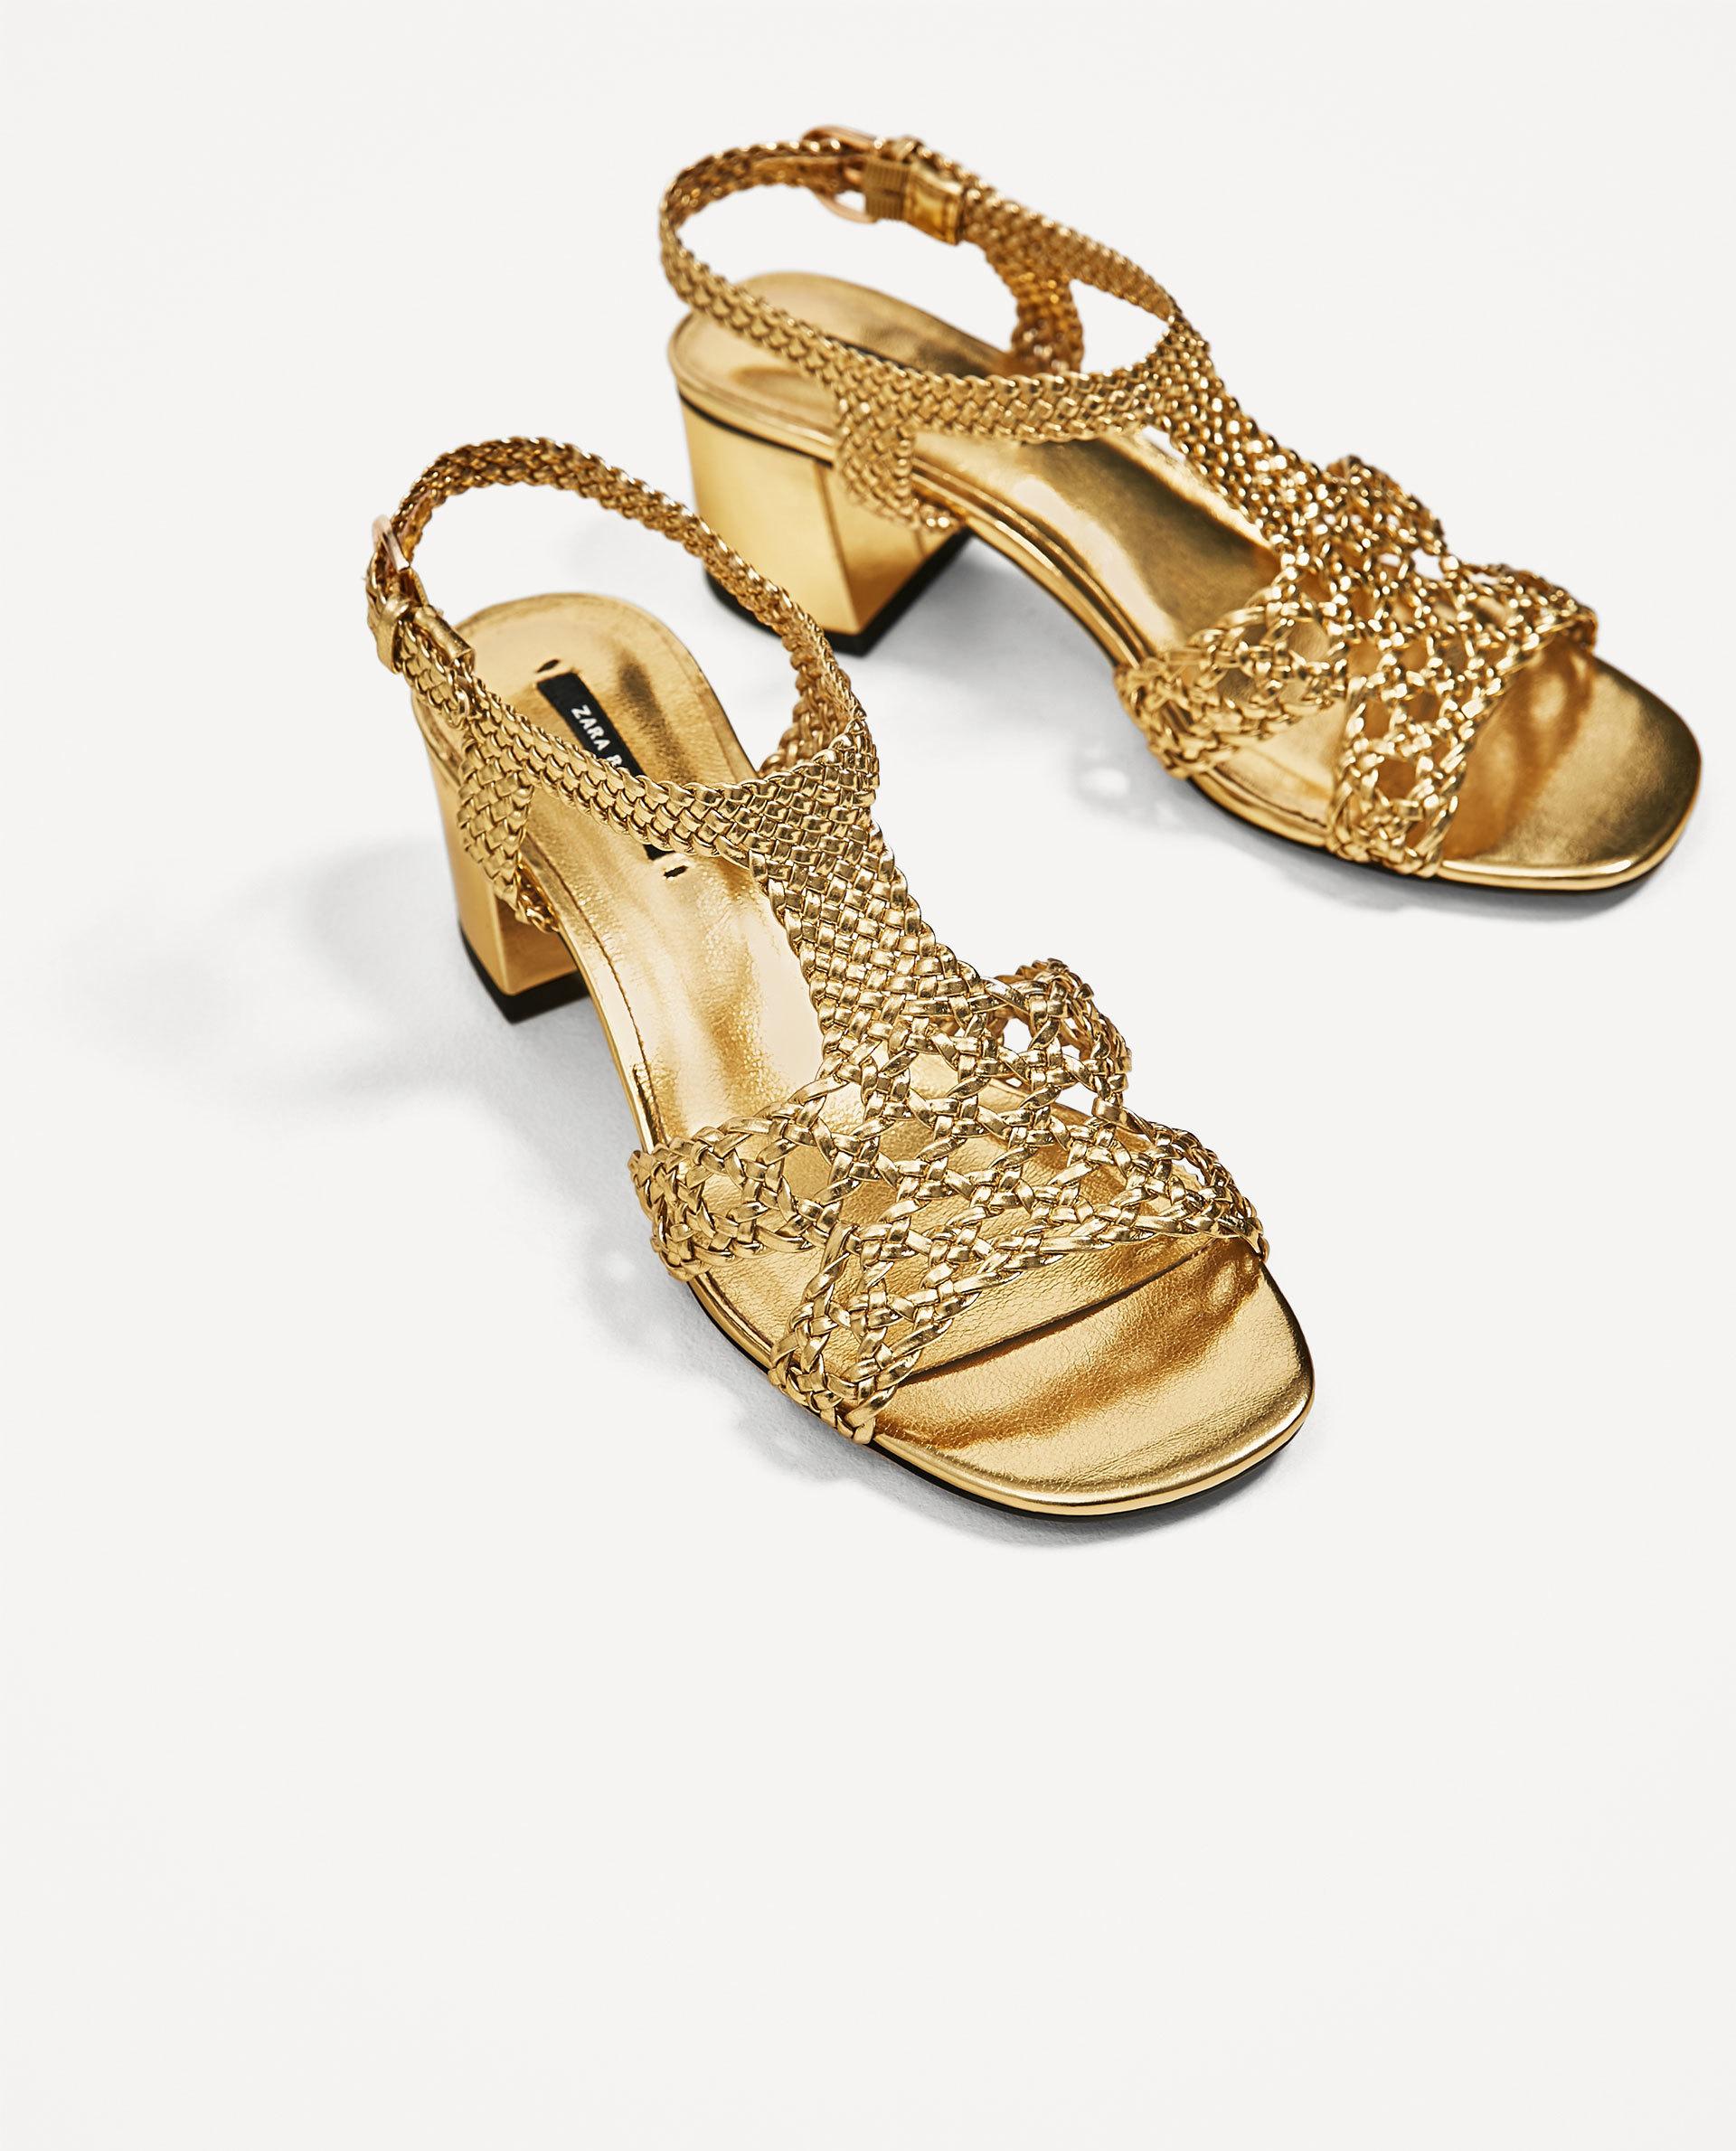 Las sandalias que firma Zara.